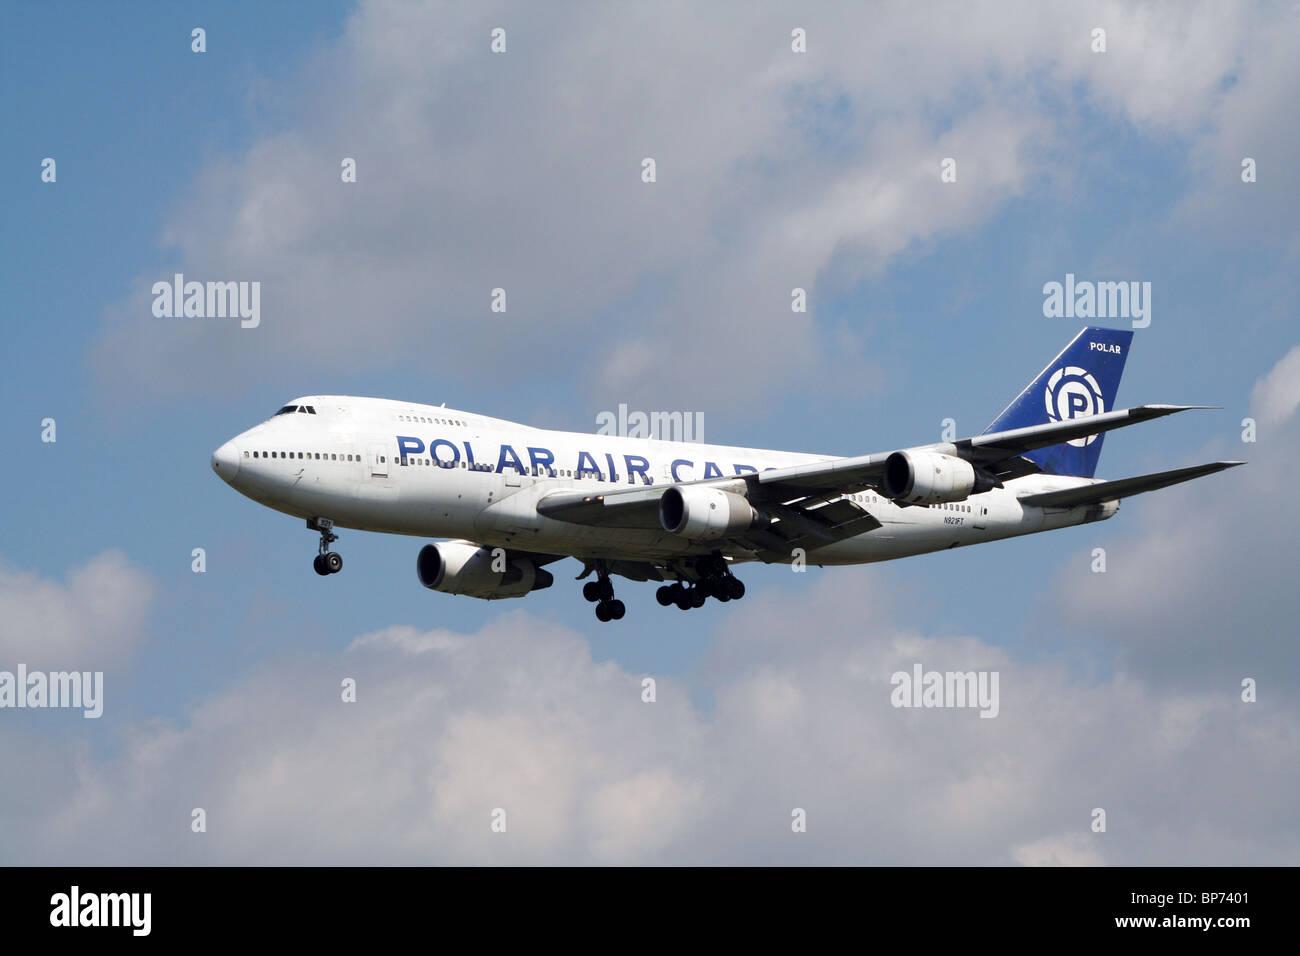 Polar Air Cargo Boeing 747 landing on Frankfurt Airport - Stock Image